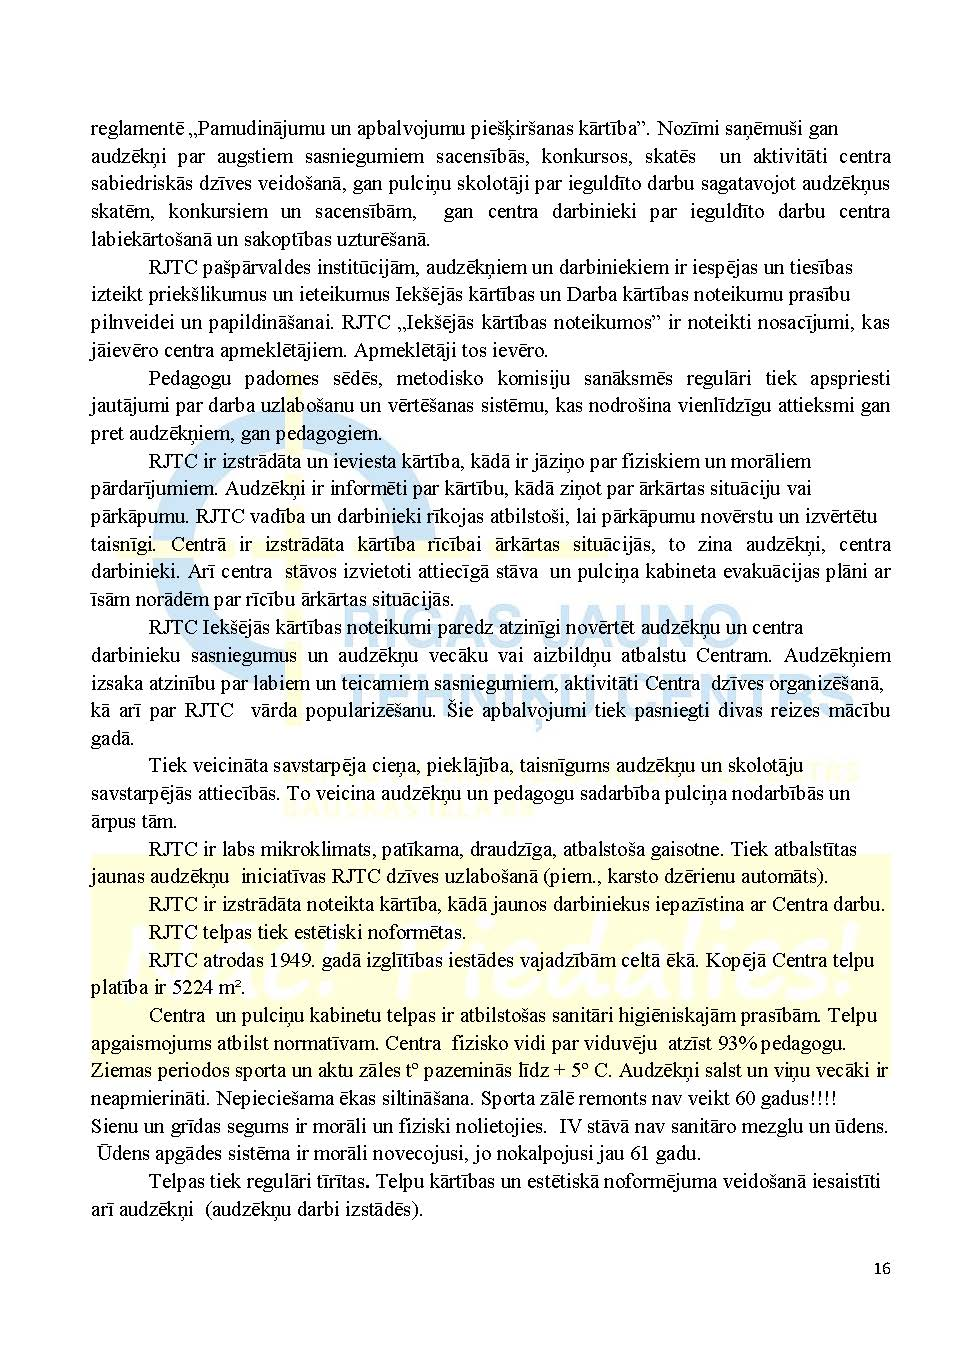 rjtc_2013-16